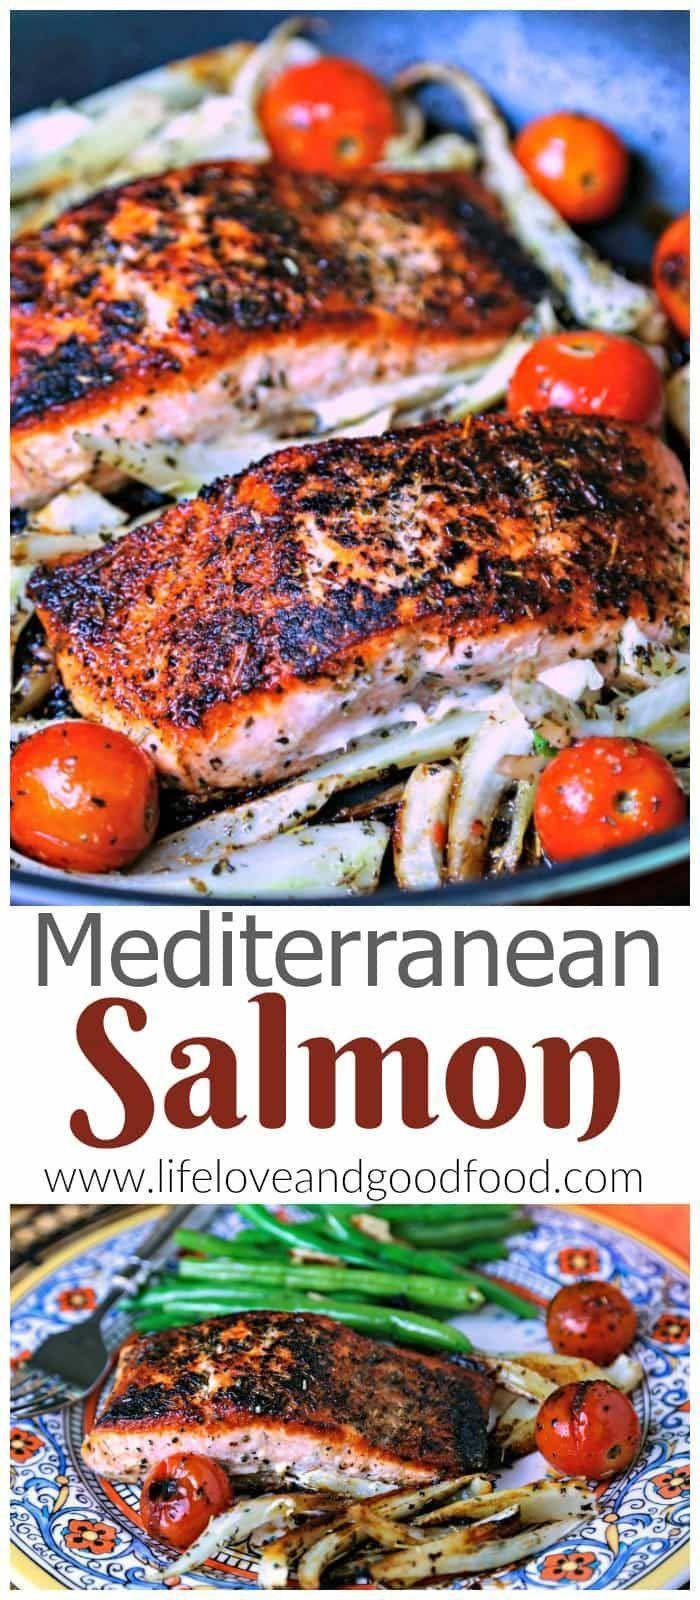 Mediterranean Salmon #mediterraneanrecipes